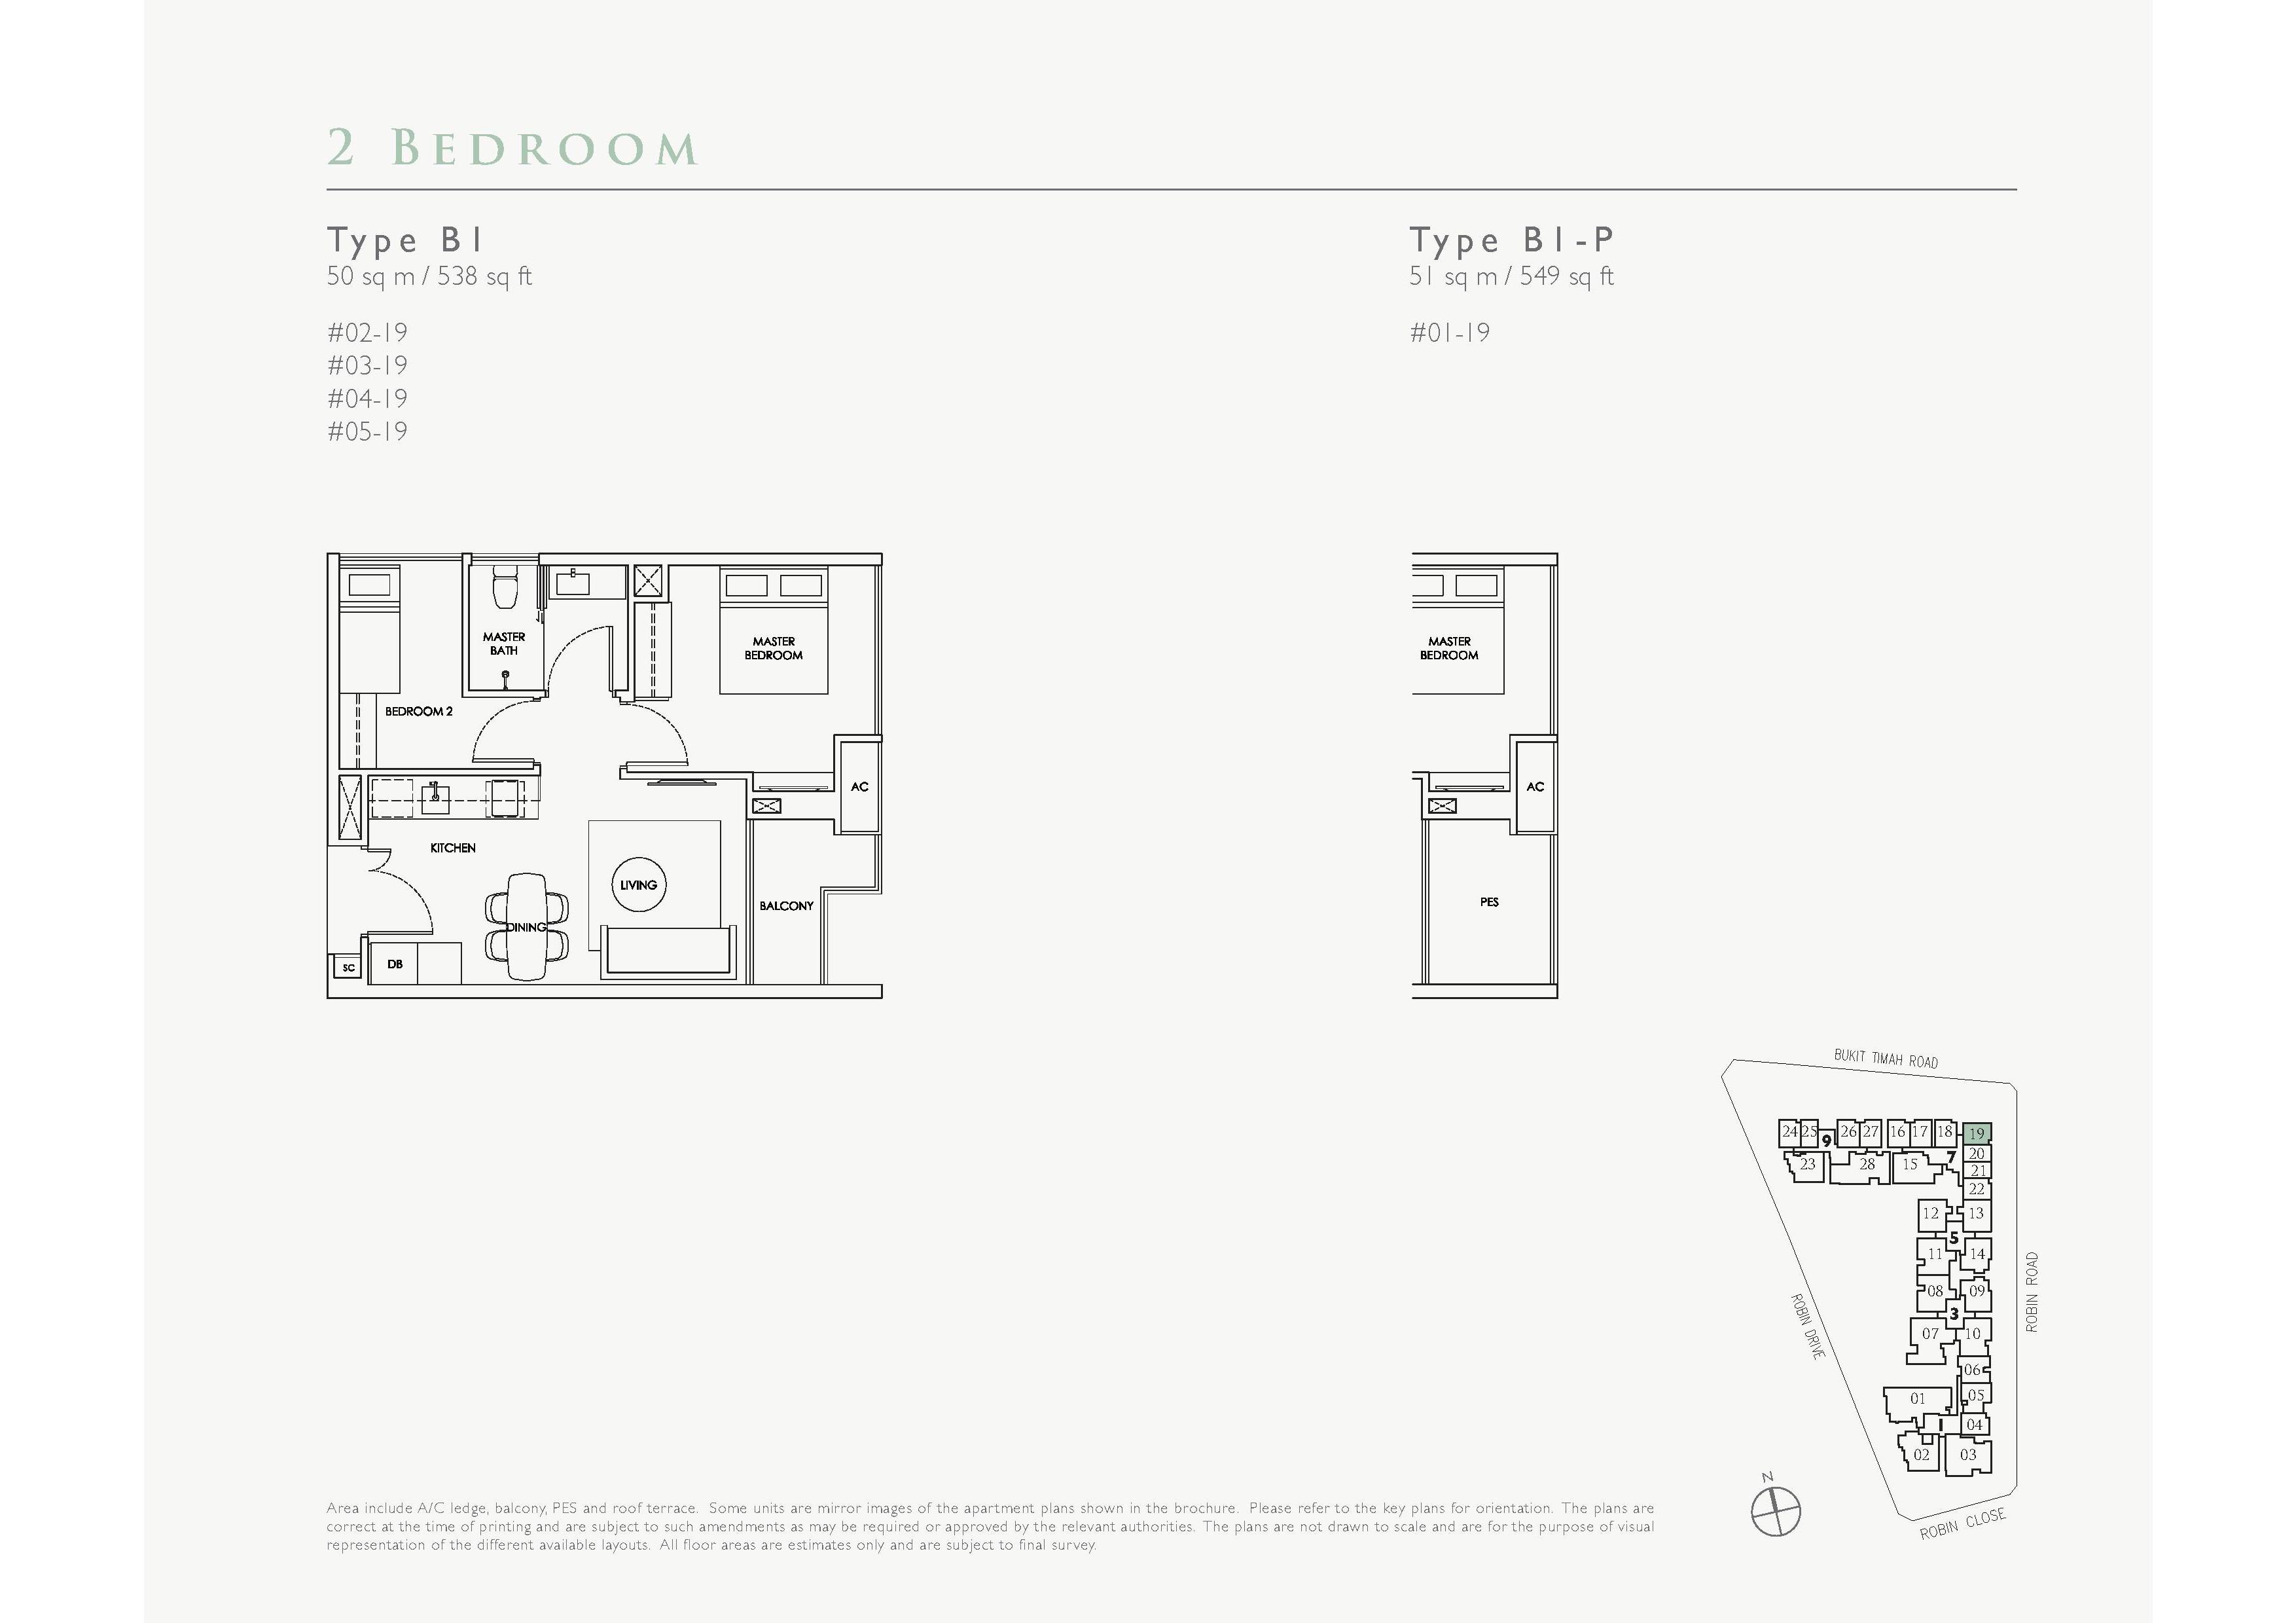 Robin Residences 2 Bedroom Floor Plans Type B1, B1-P